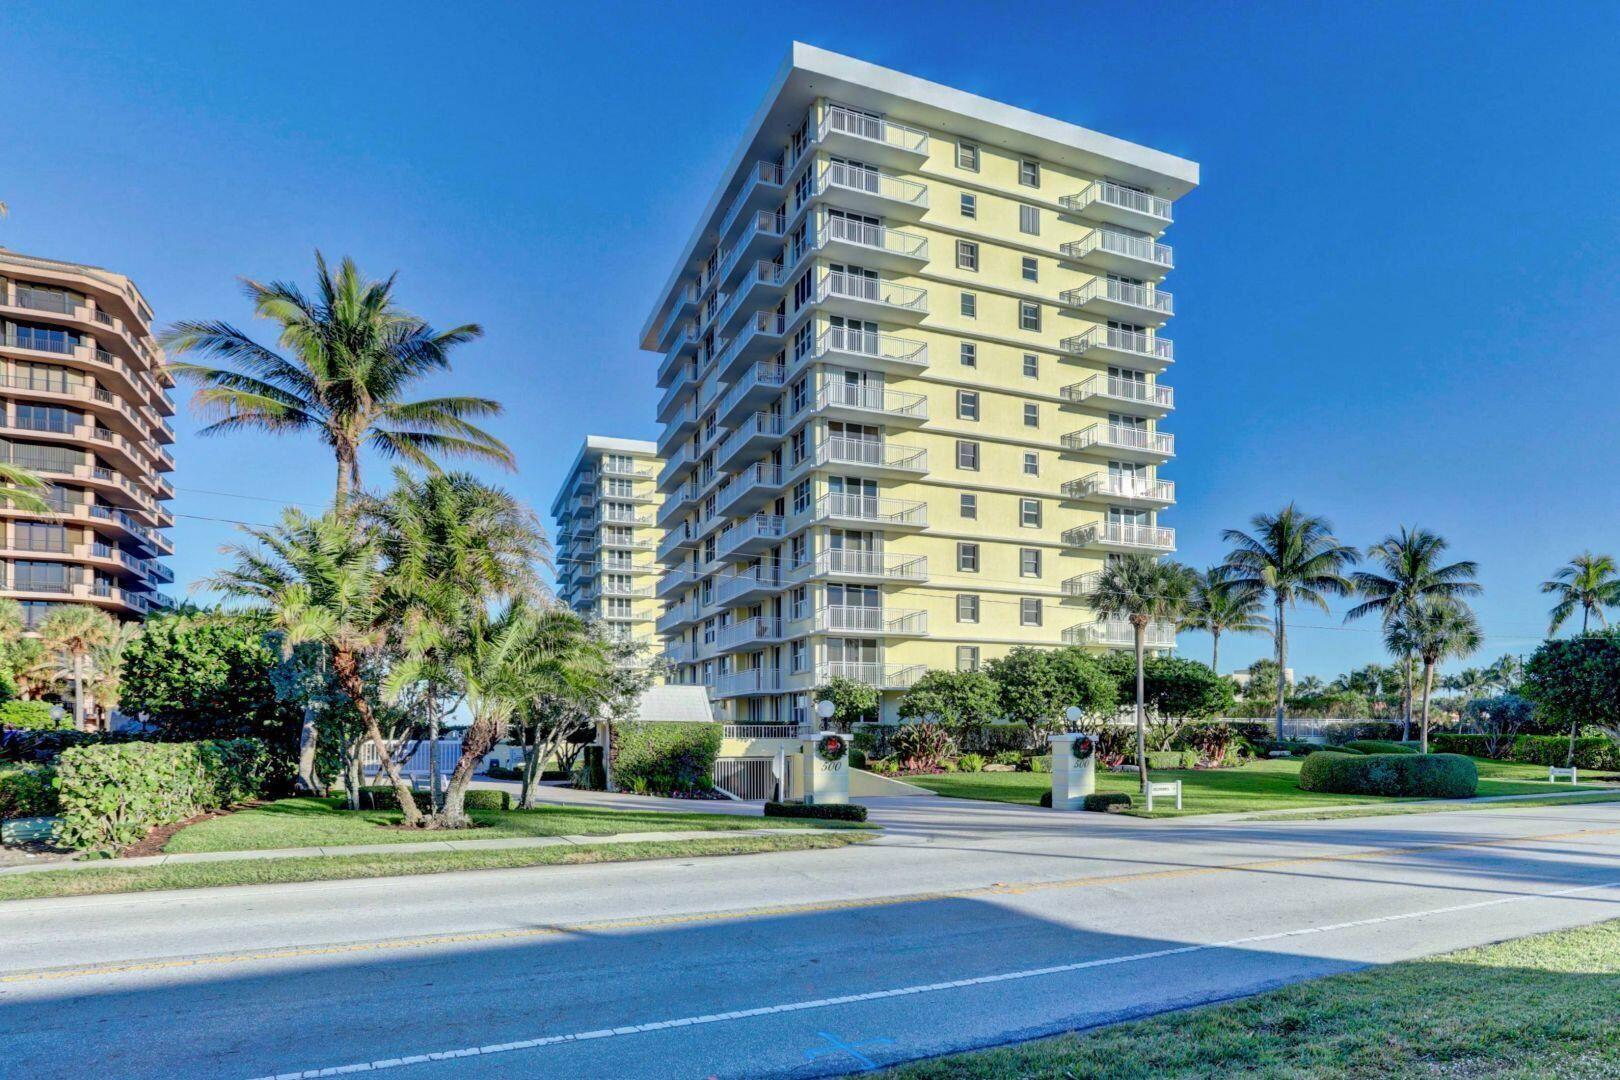 Photo for 500 Ocean Drive #W-3-C, Juno Beach, FL 33408 (MLS # RX-10742339)